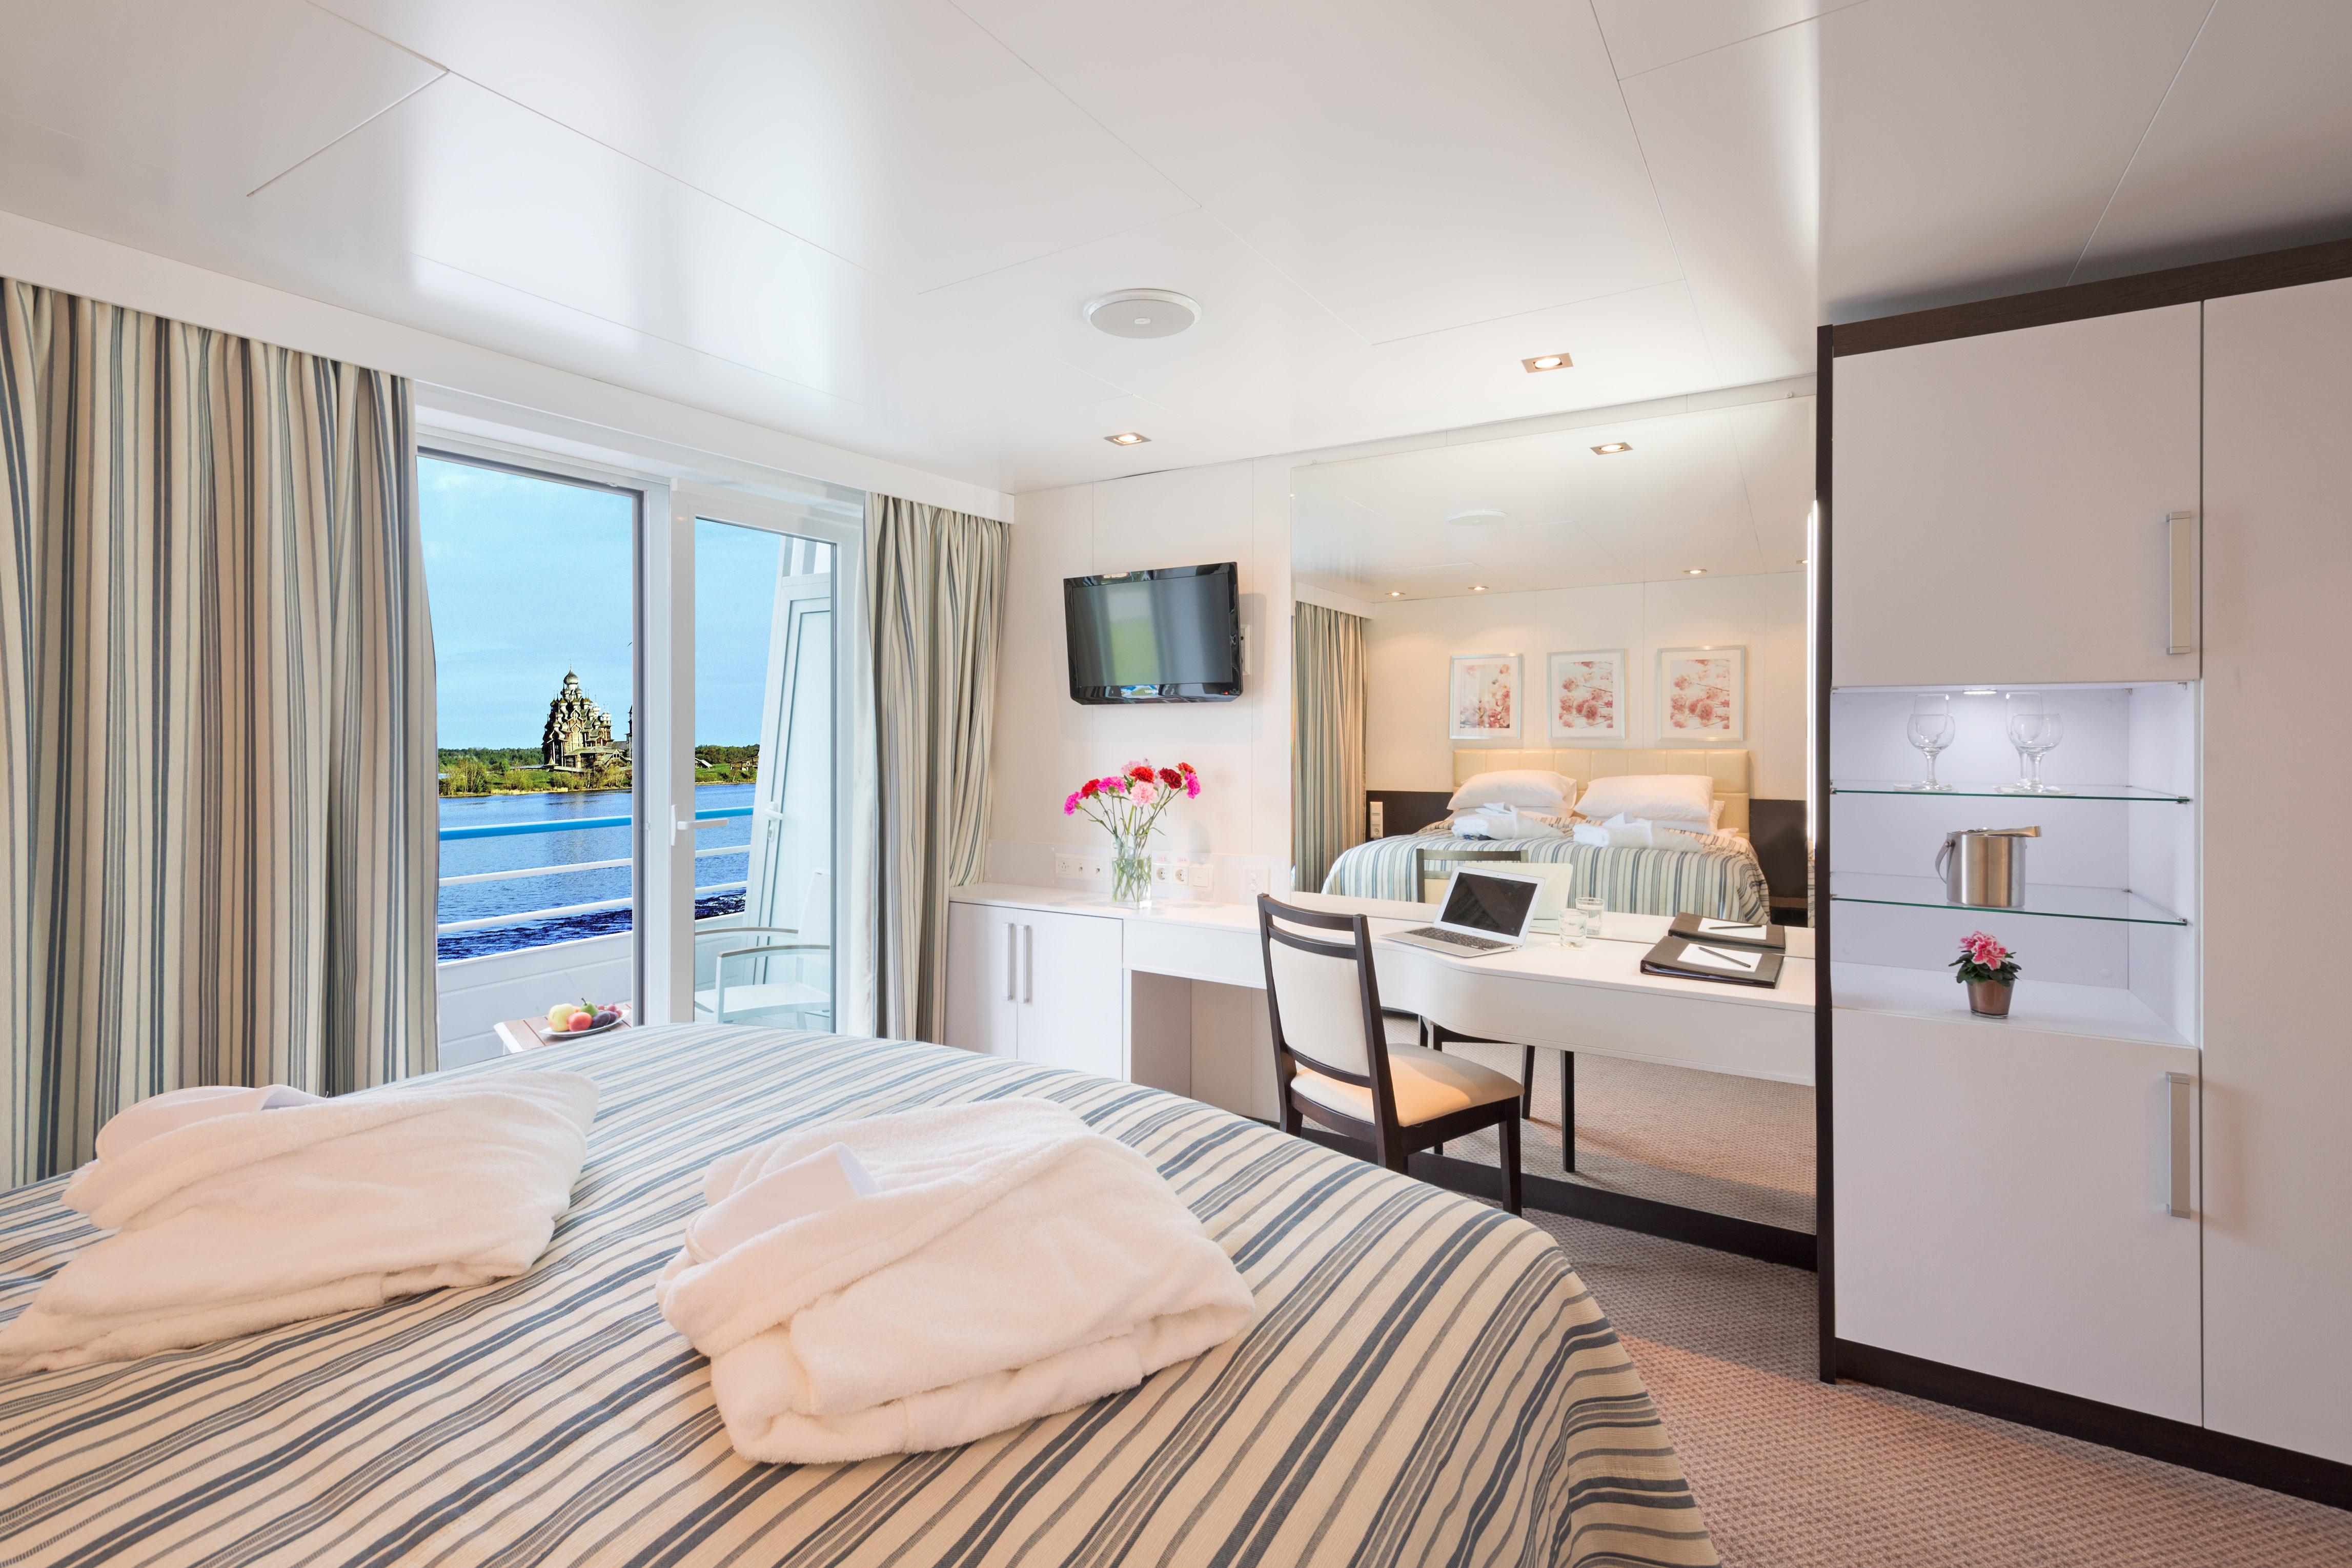 Scenic Tsar Accommodation Deluxe Balcony Suite 1.jpg